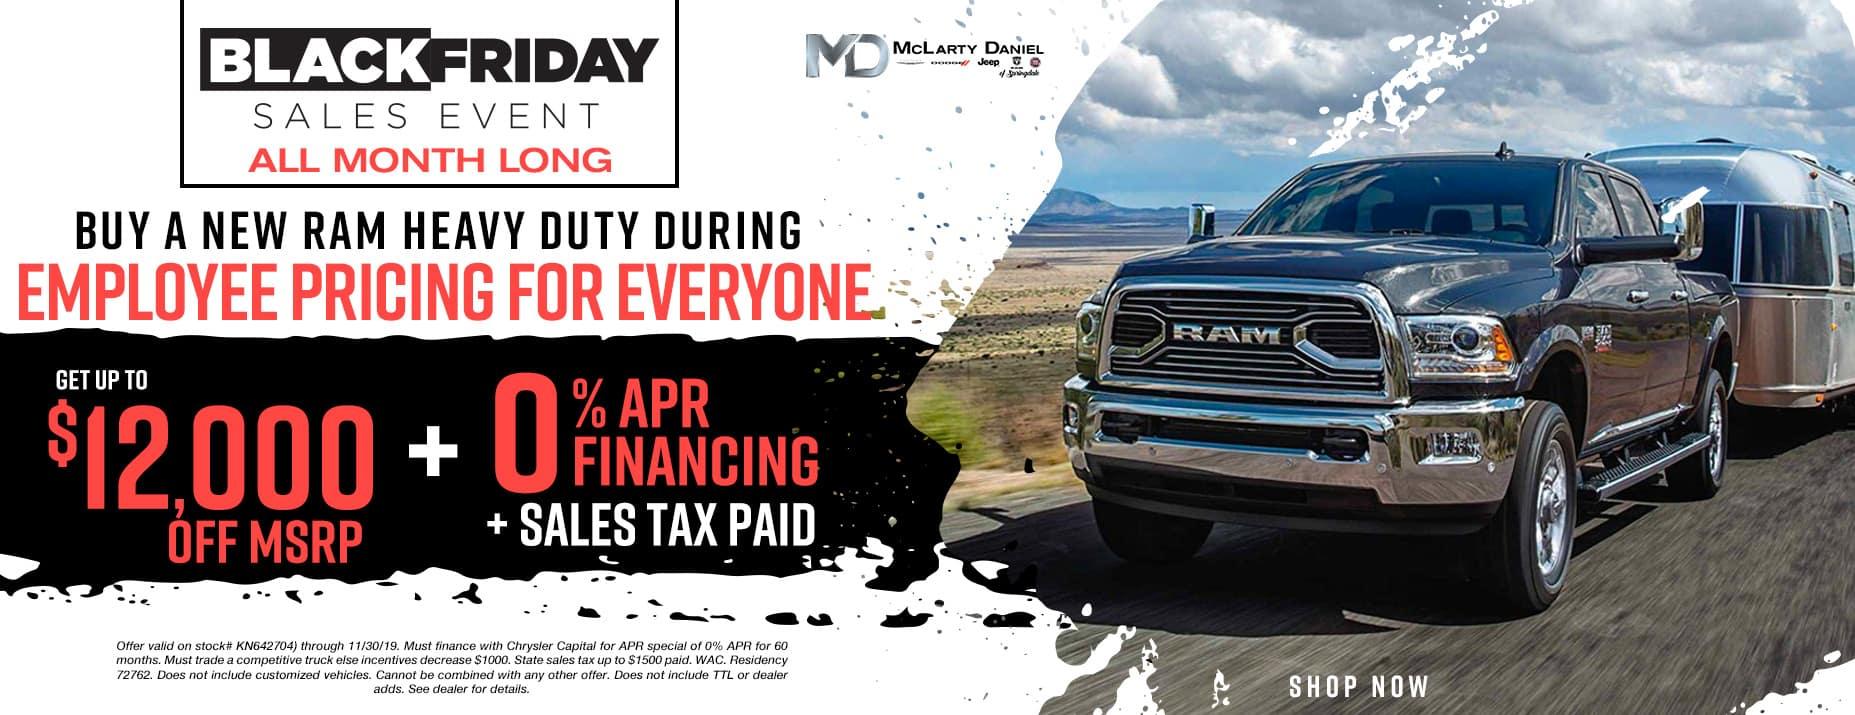 DURING EMPLOYEE PRICING FOREVERYONE, GETUP TO $12,000 OFFNEWRAM HEAVY DUTIESPLUS 0% FINANCING PLUS SALES TAX PAID!